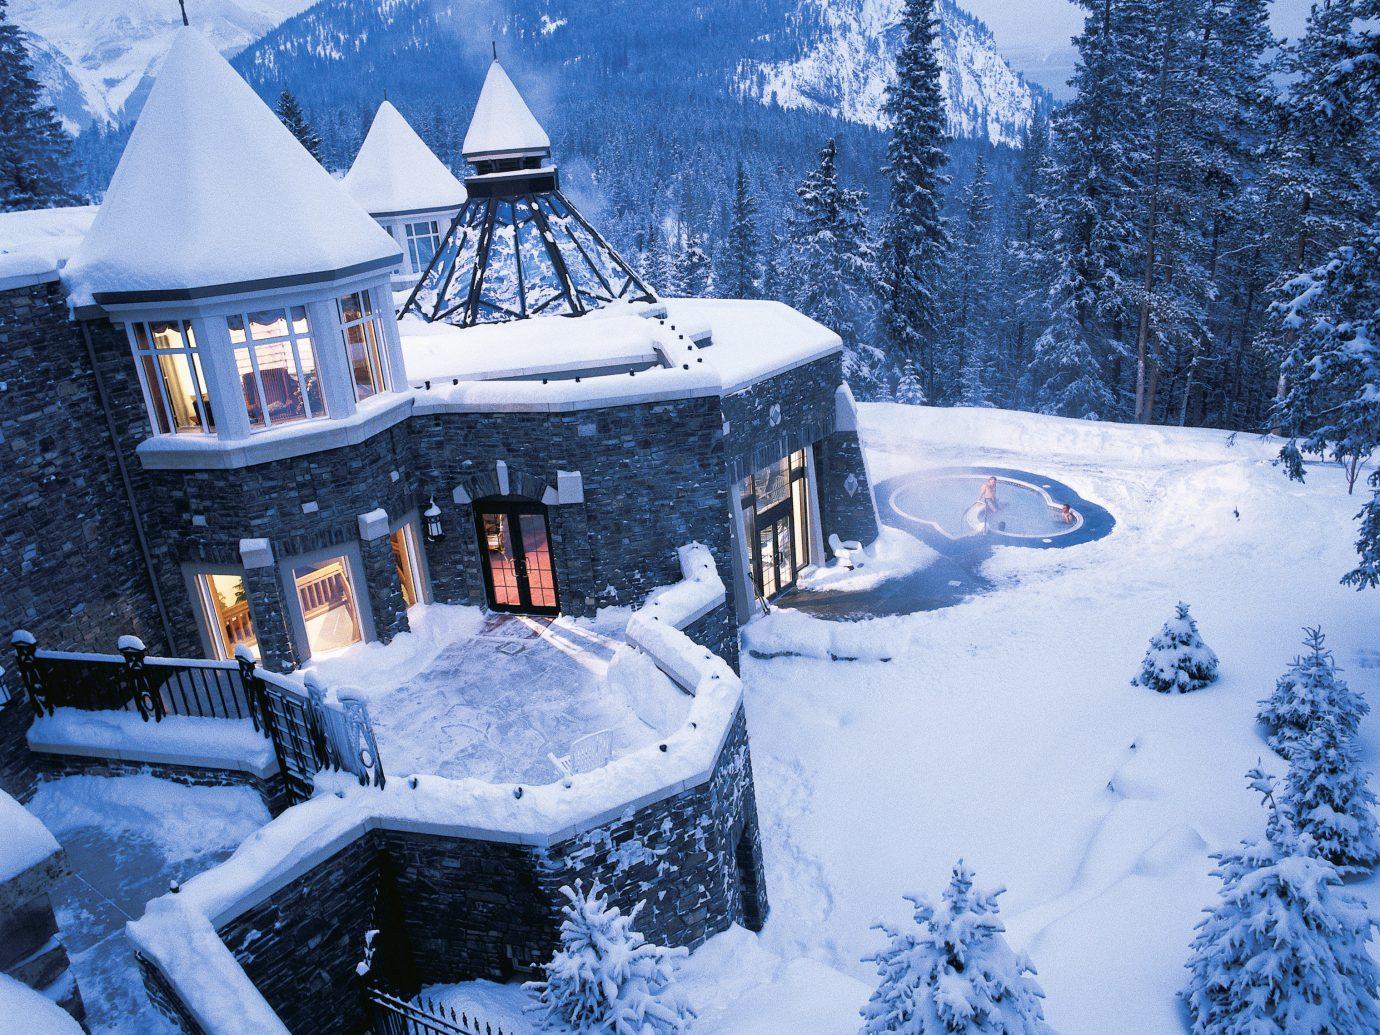 Health + Wellness Spa Retreats Trip Ideas snow outdoor tree sky Winter Nature weather season mountain freezing Resort blizzard